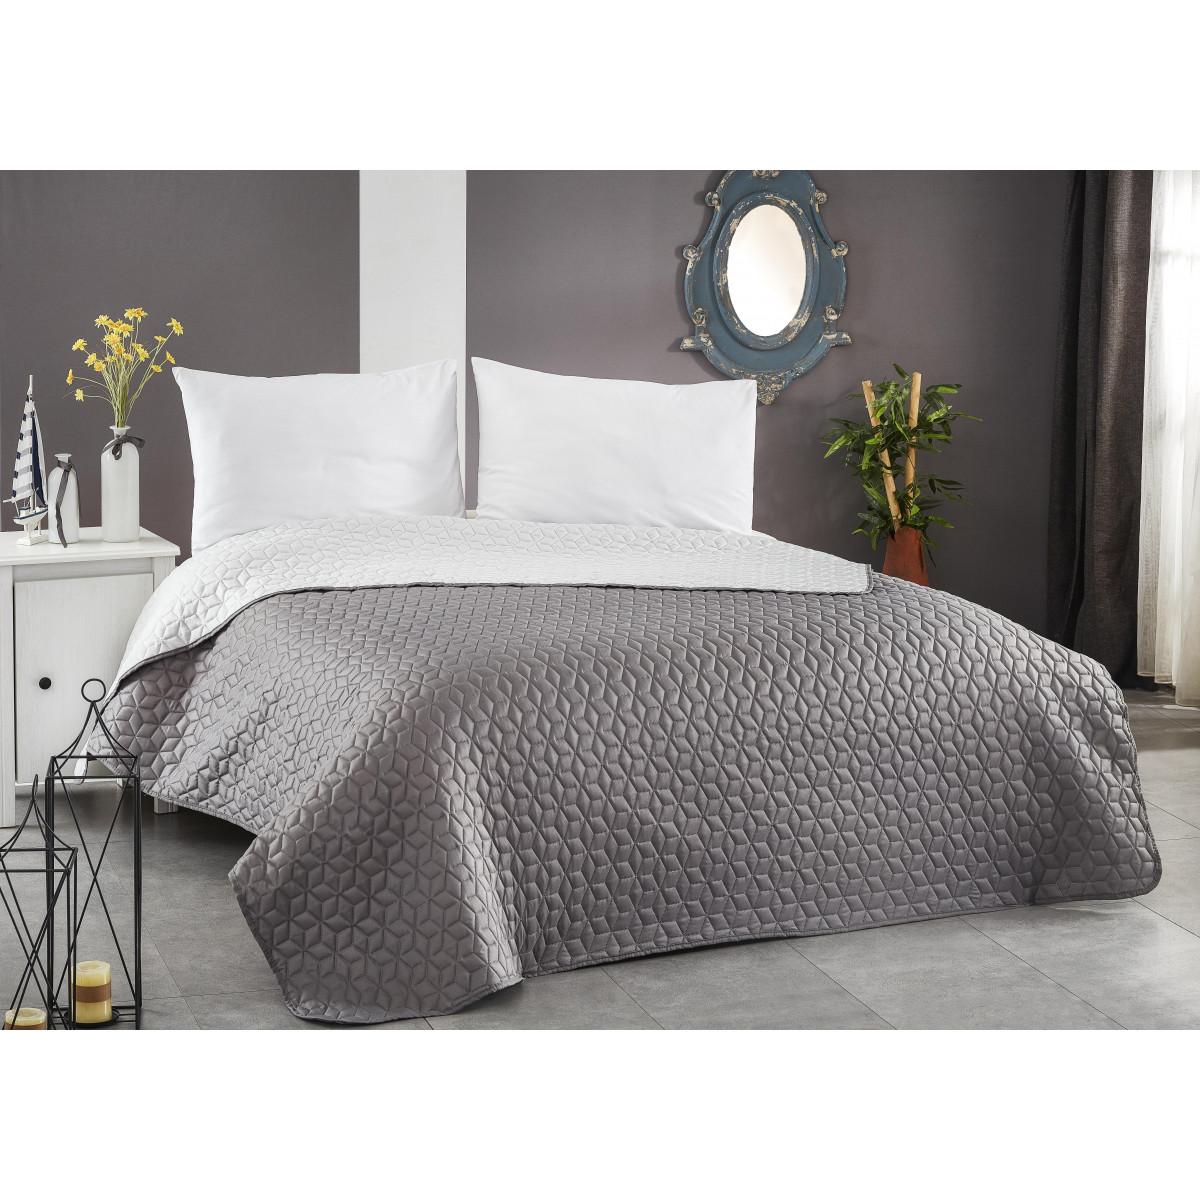 Покривало за легло ултрасоник - ГРАФИТ